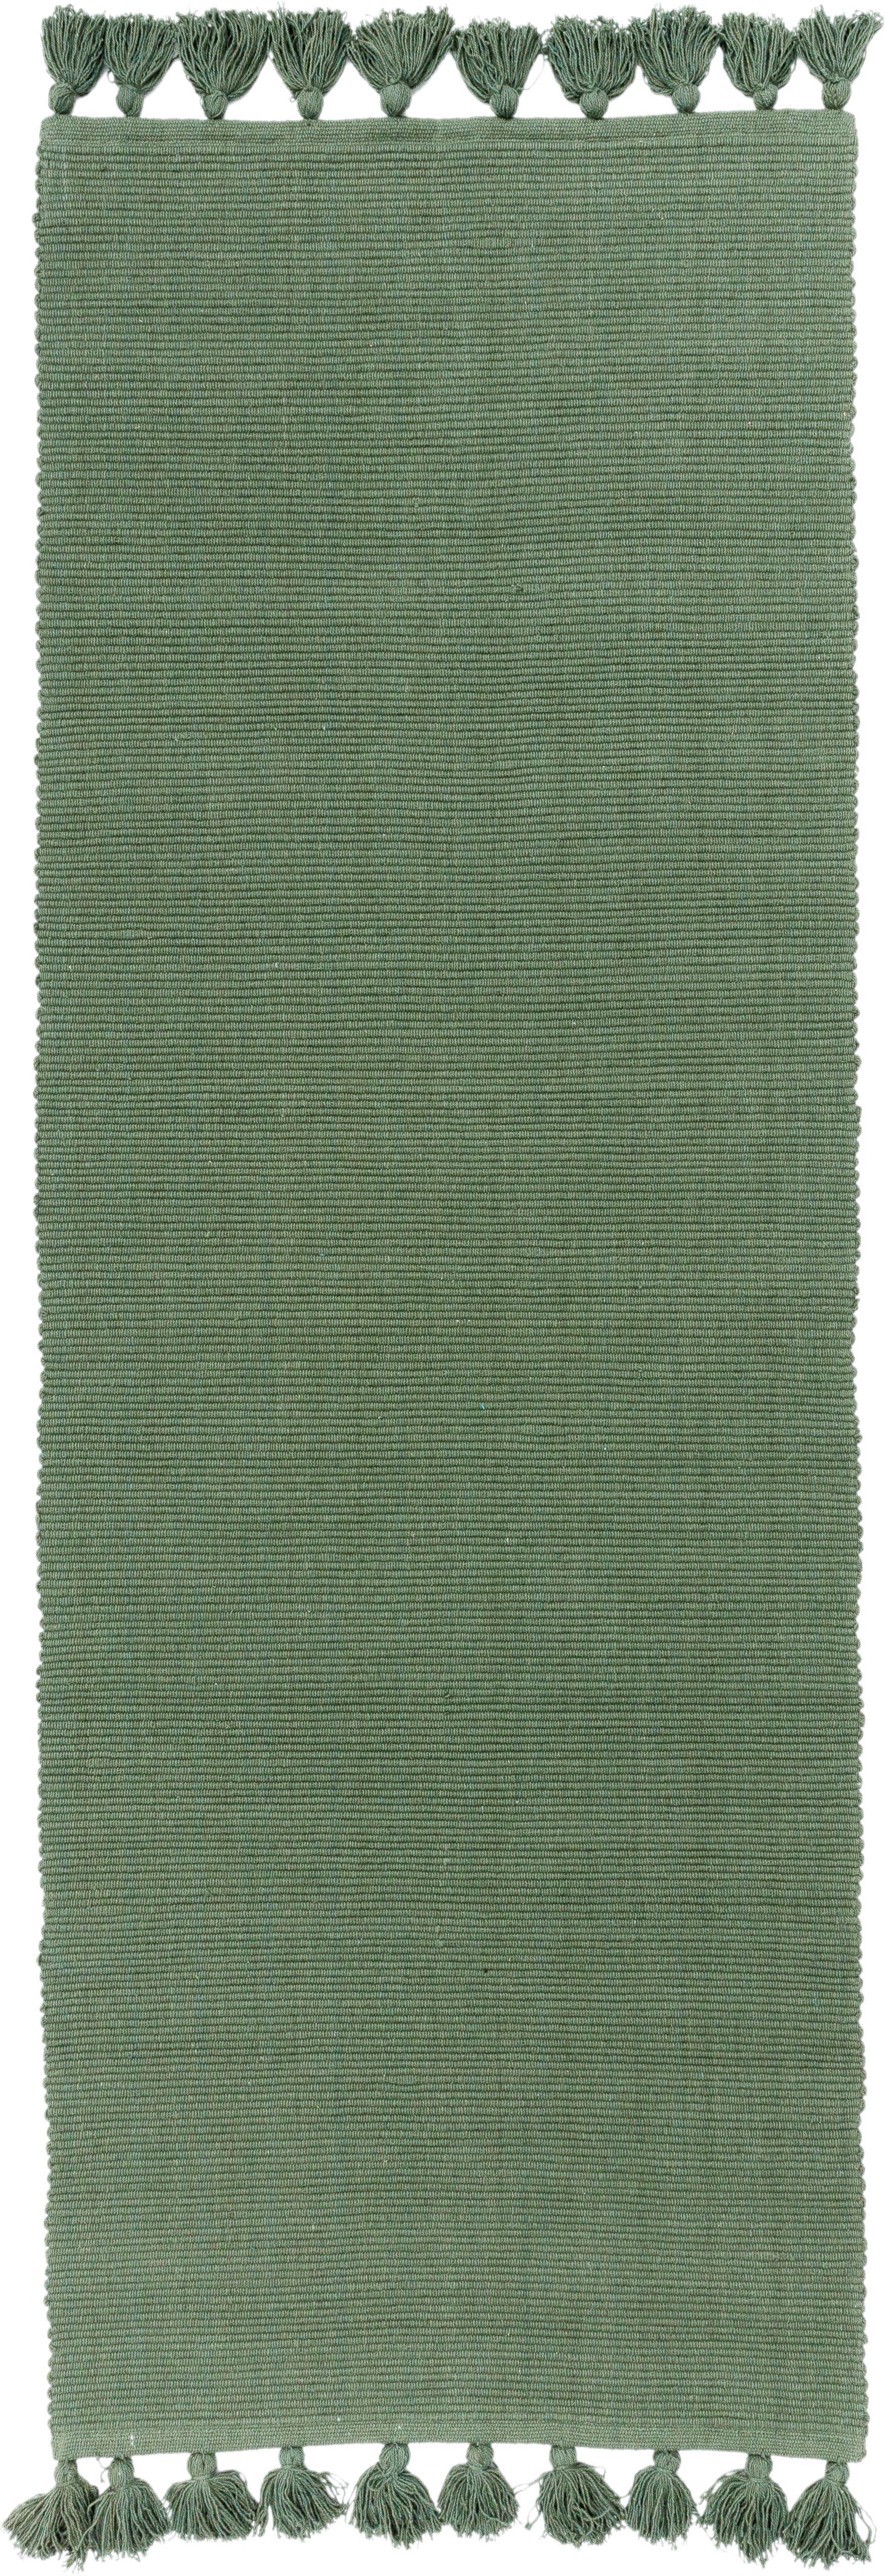 Loper Homer, Katoen, Bosgroen, 70 x 216 cm